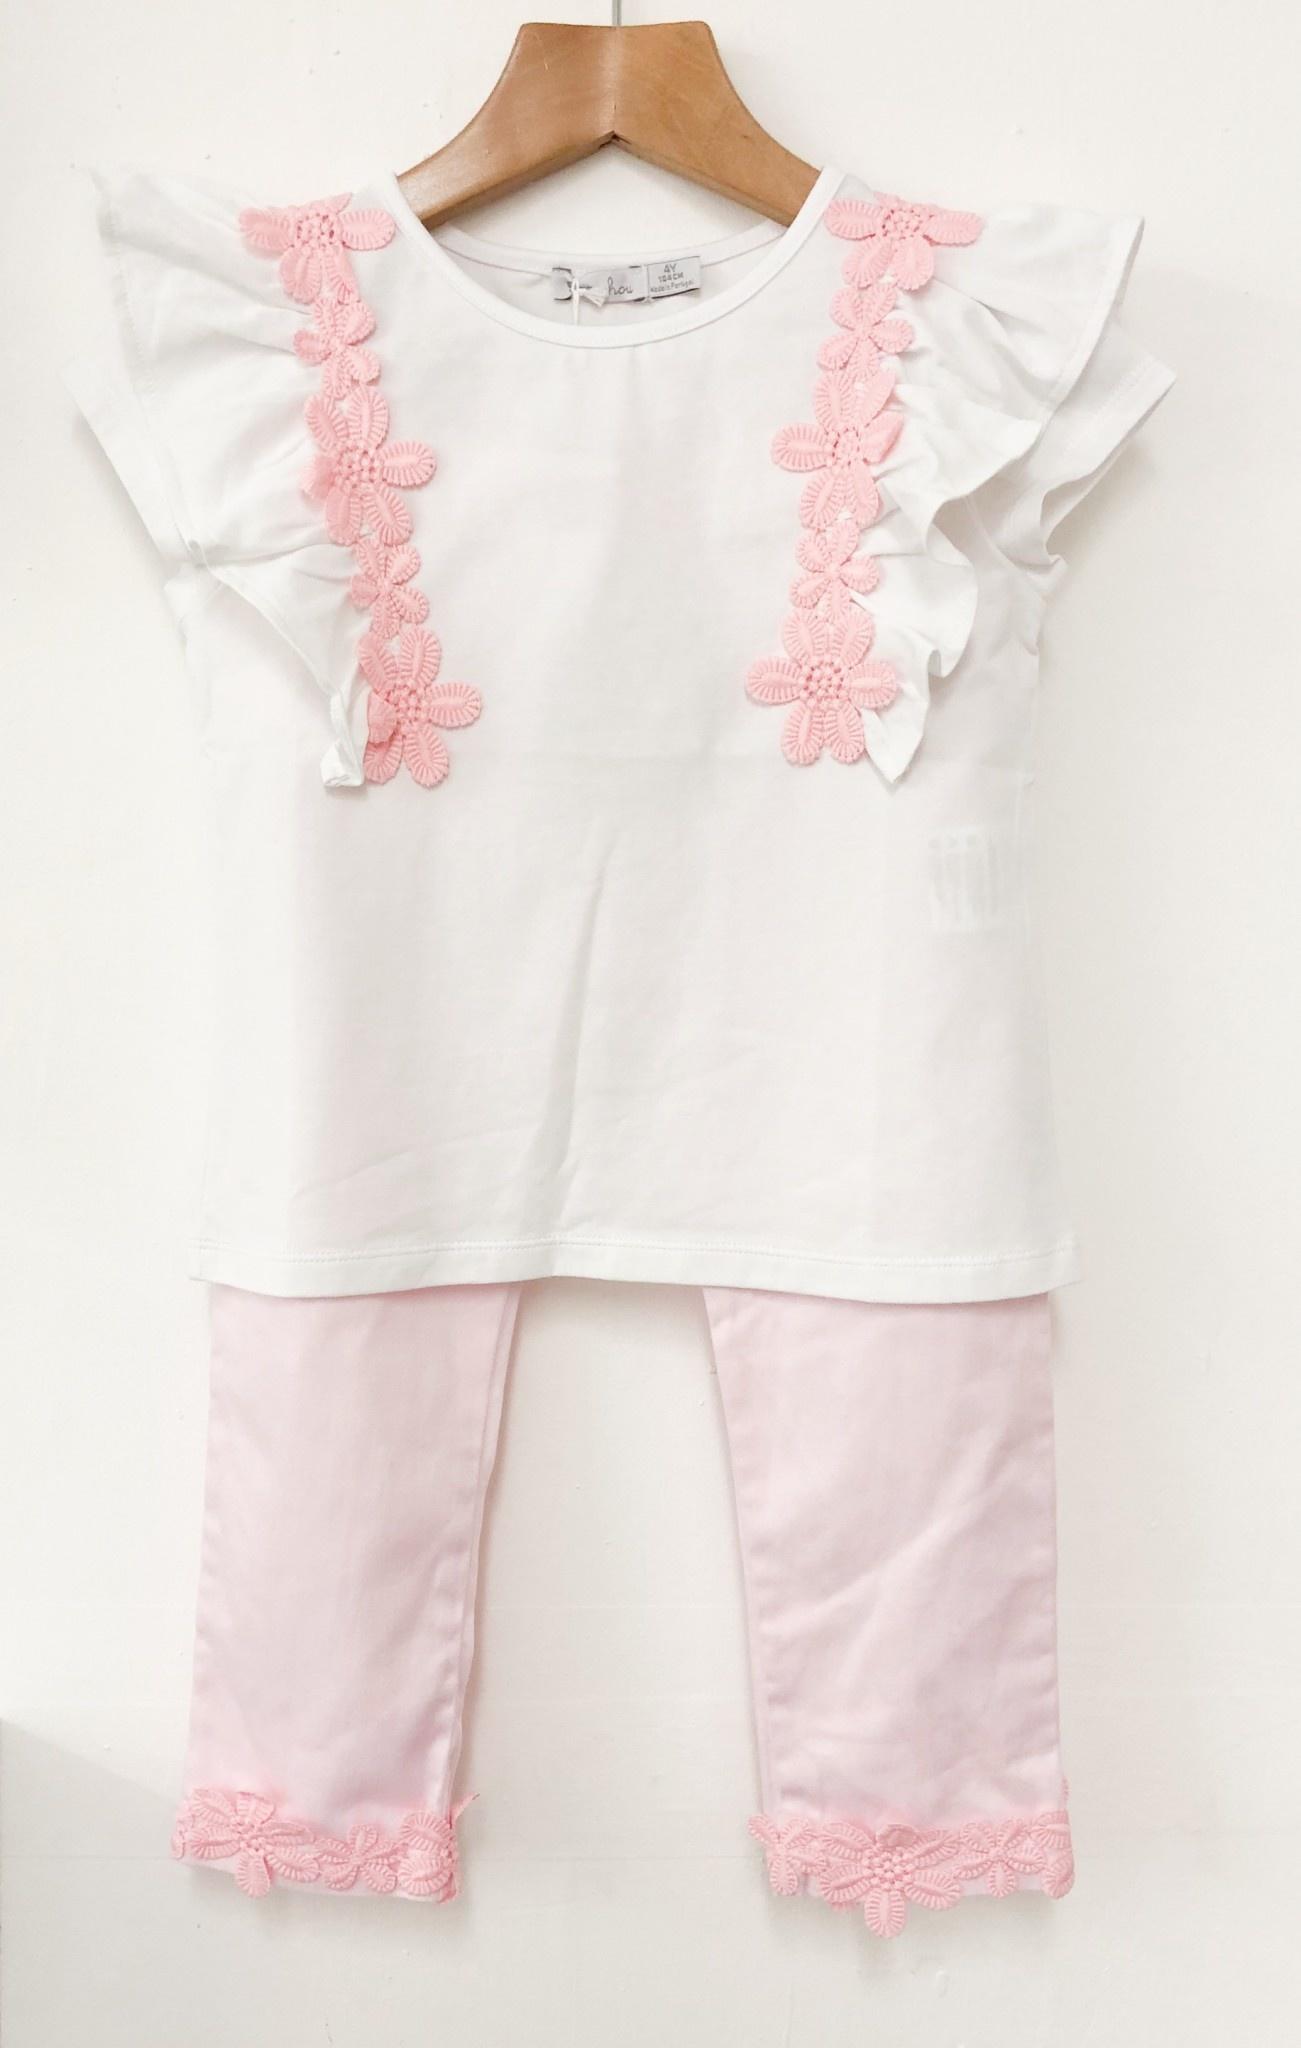 Patachou Patachou Girls 401/406 T-shirt & Trousers with Flower Detail